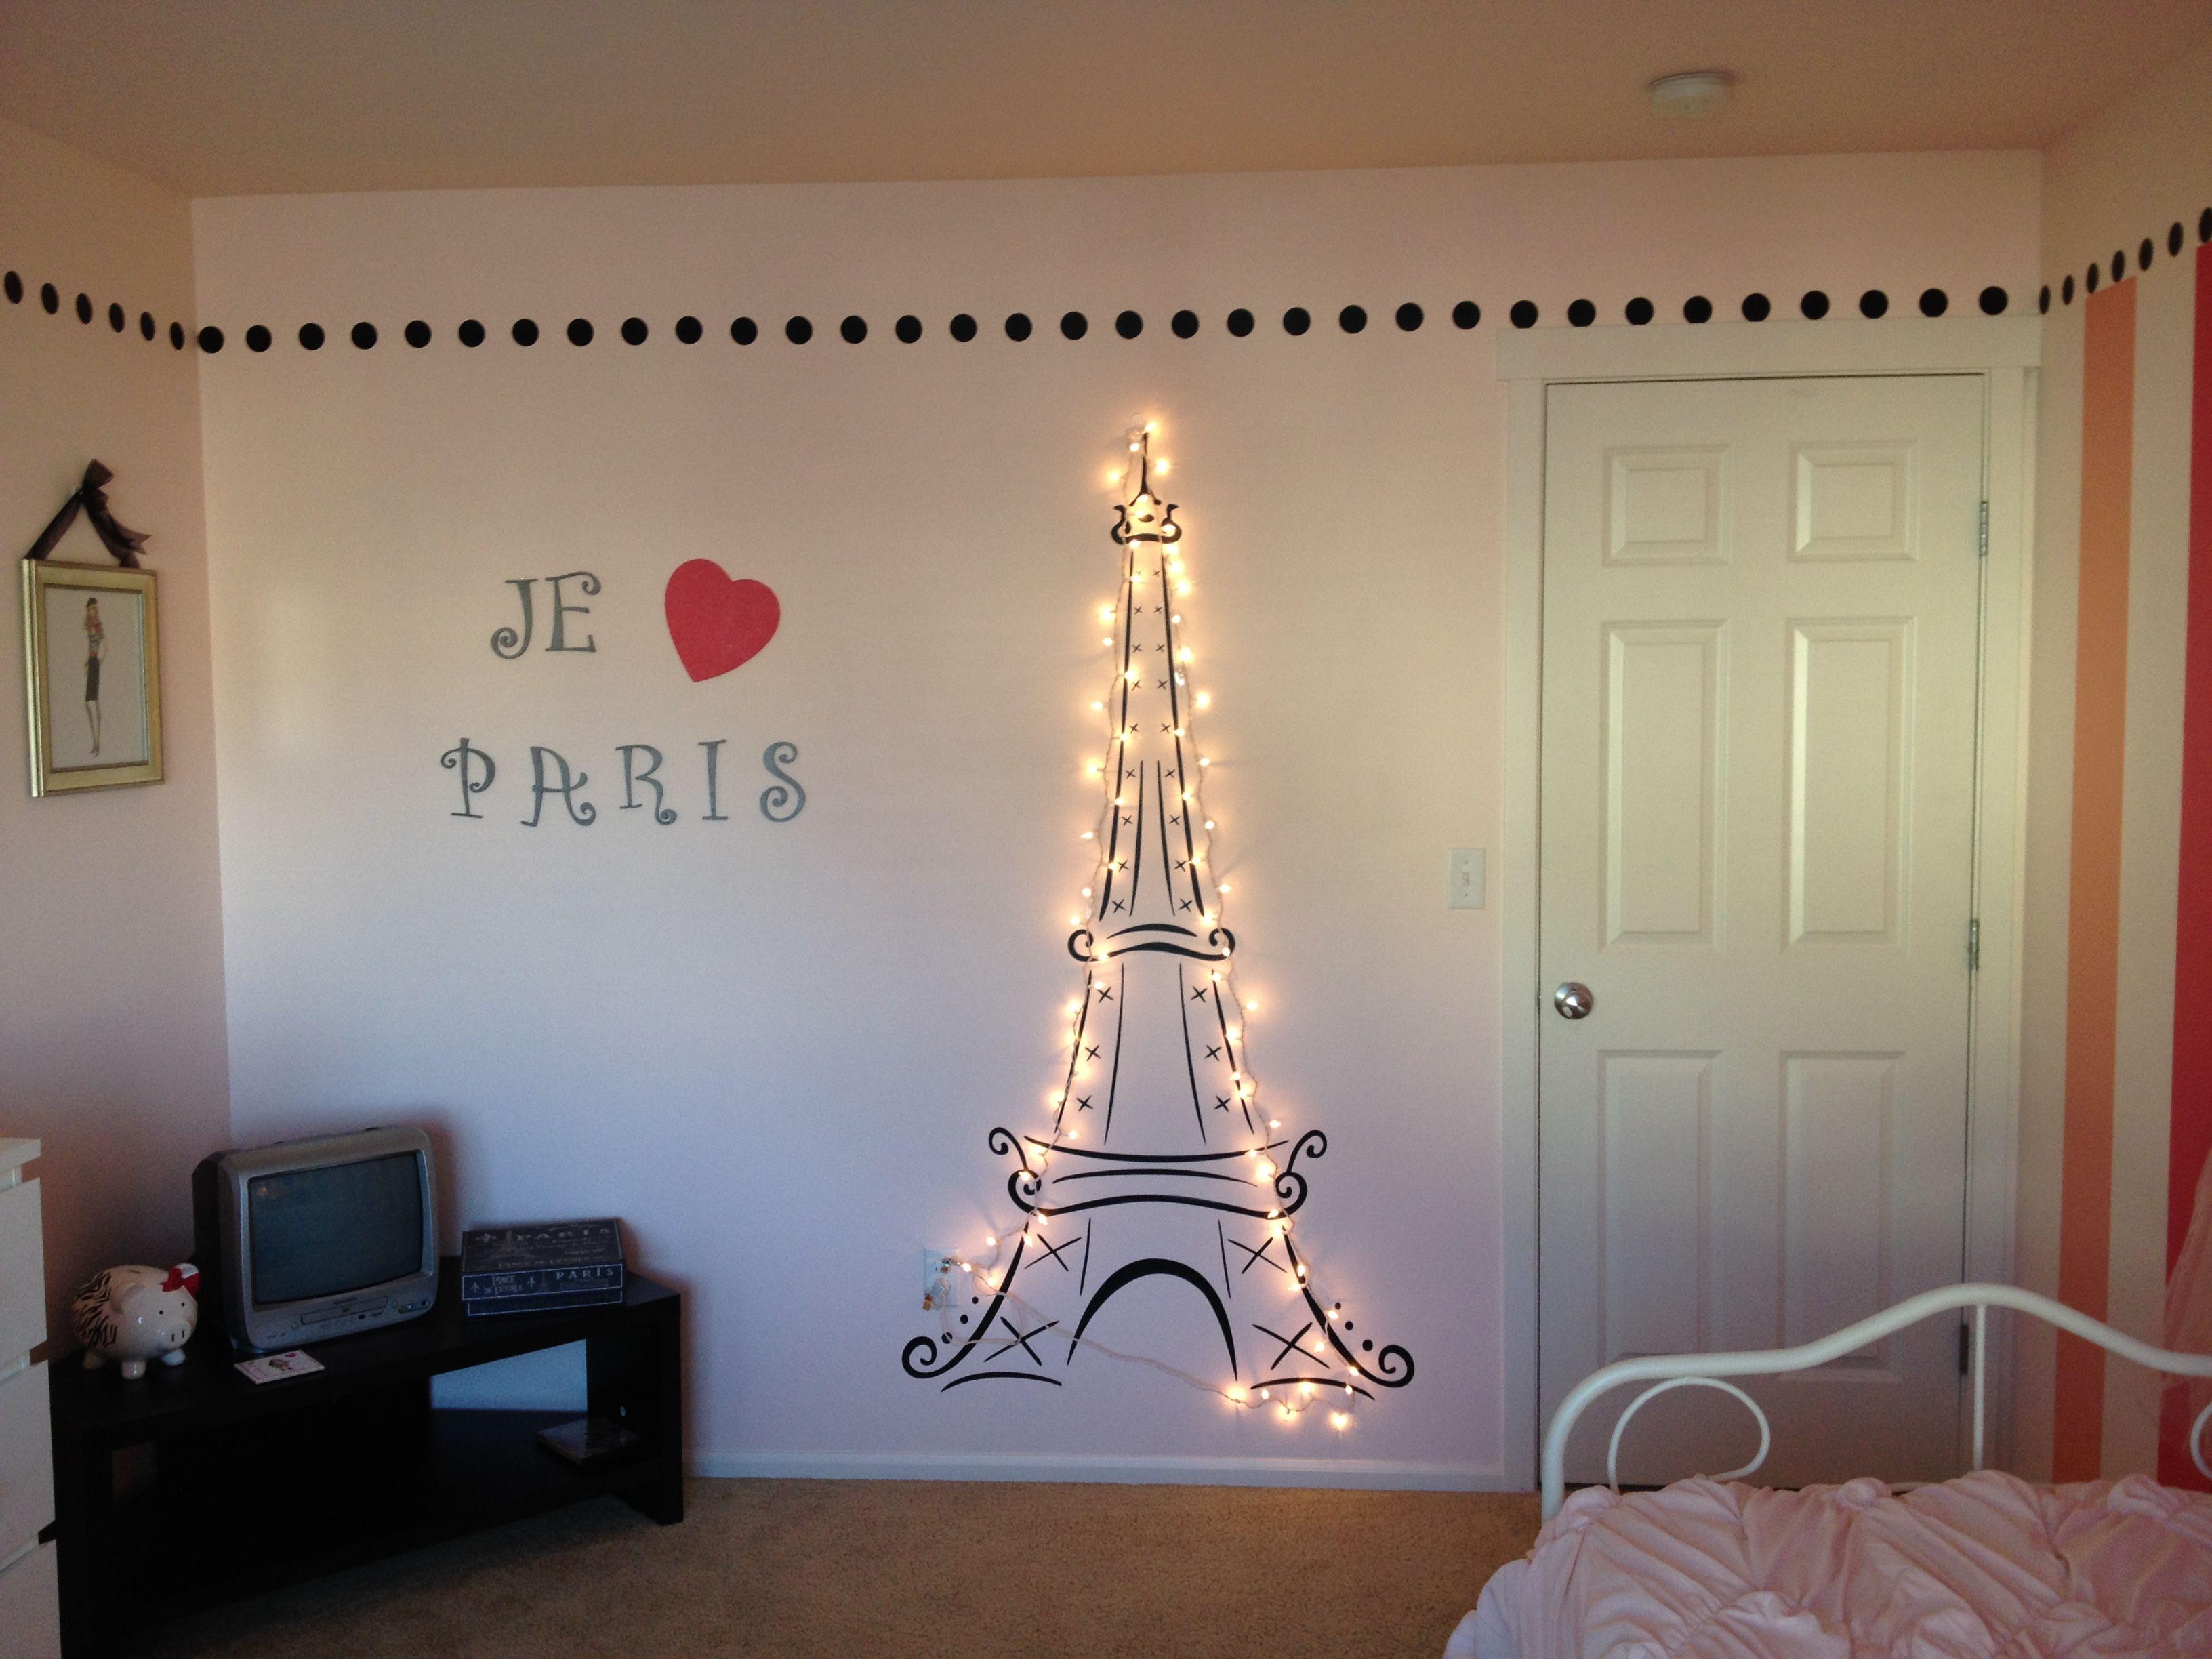 Lit Eiffel Tower For My Daughter S Paris Themed Room Paris Room